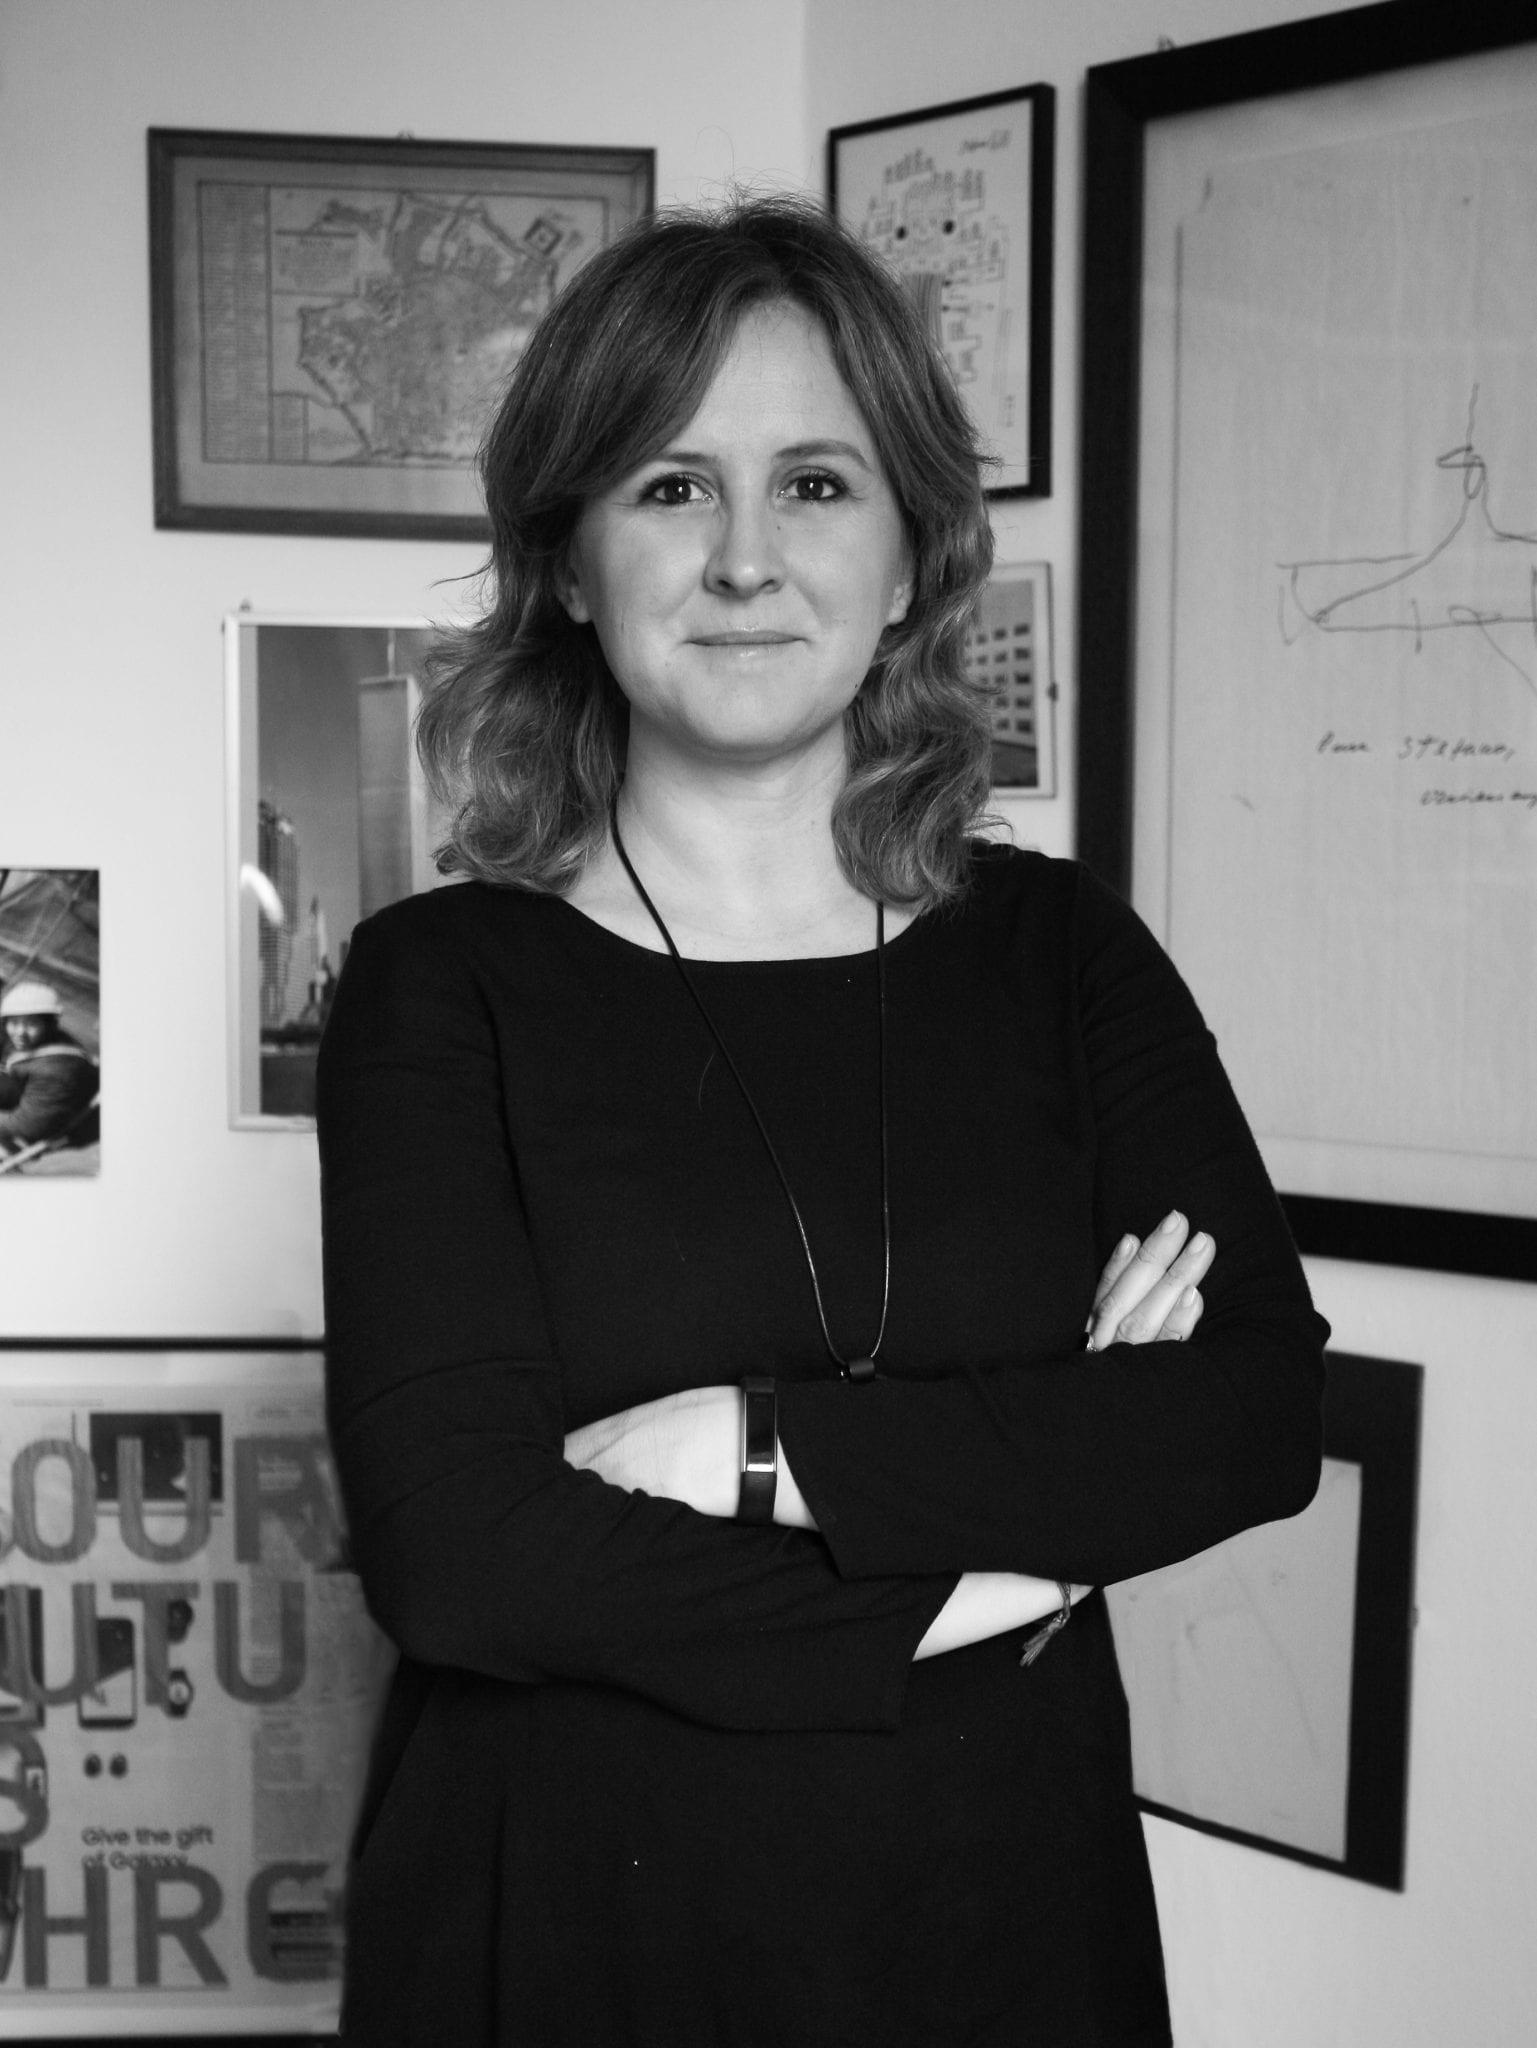 Alessandra Bianchi Architetto stefano boeri architetti | stefano boeri architetti